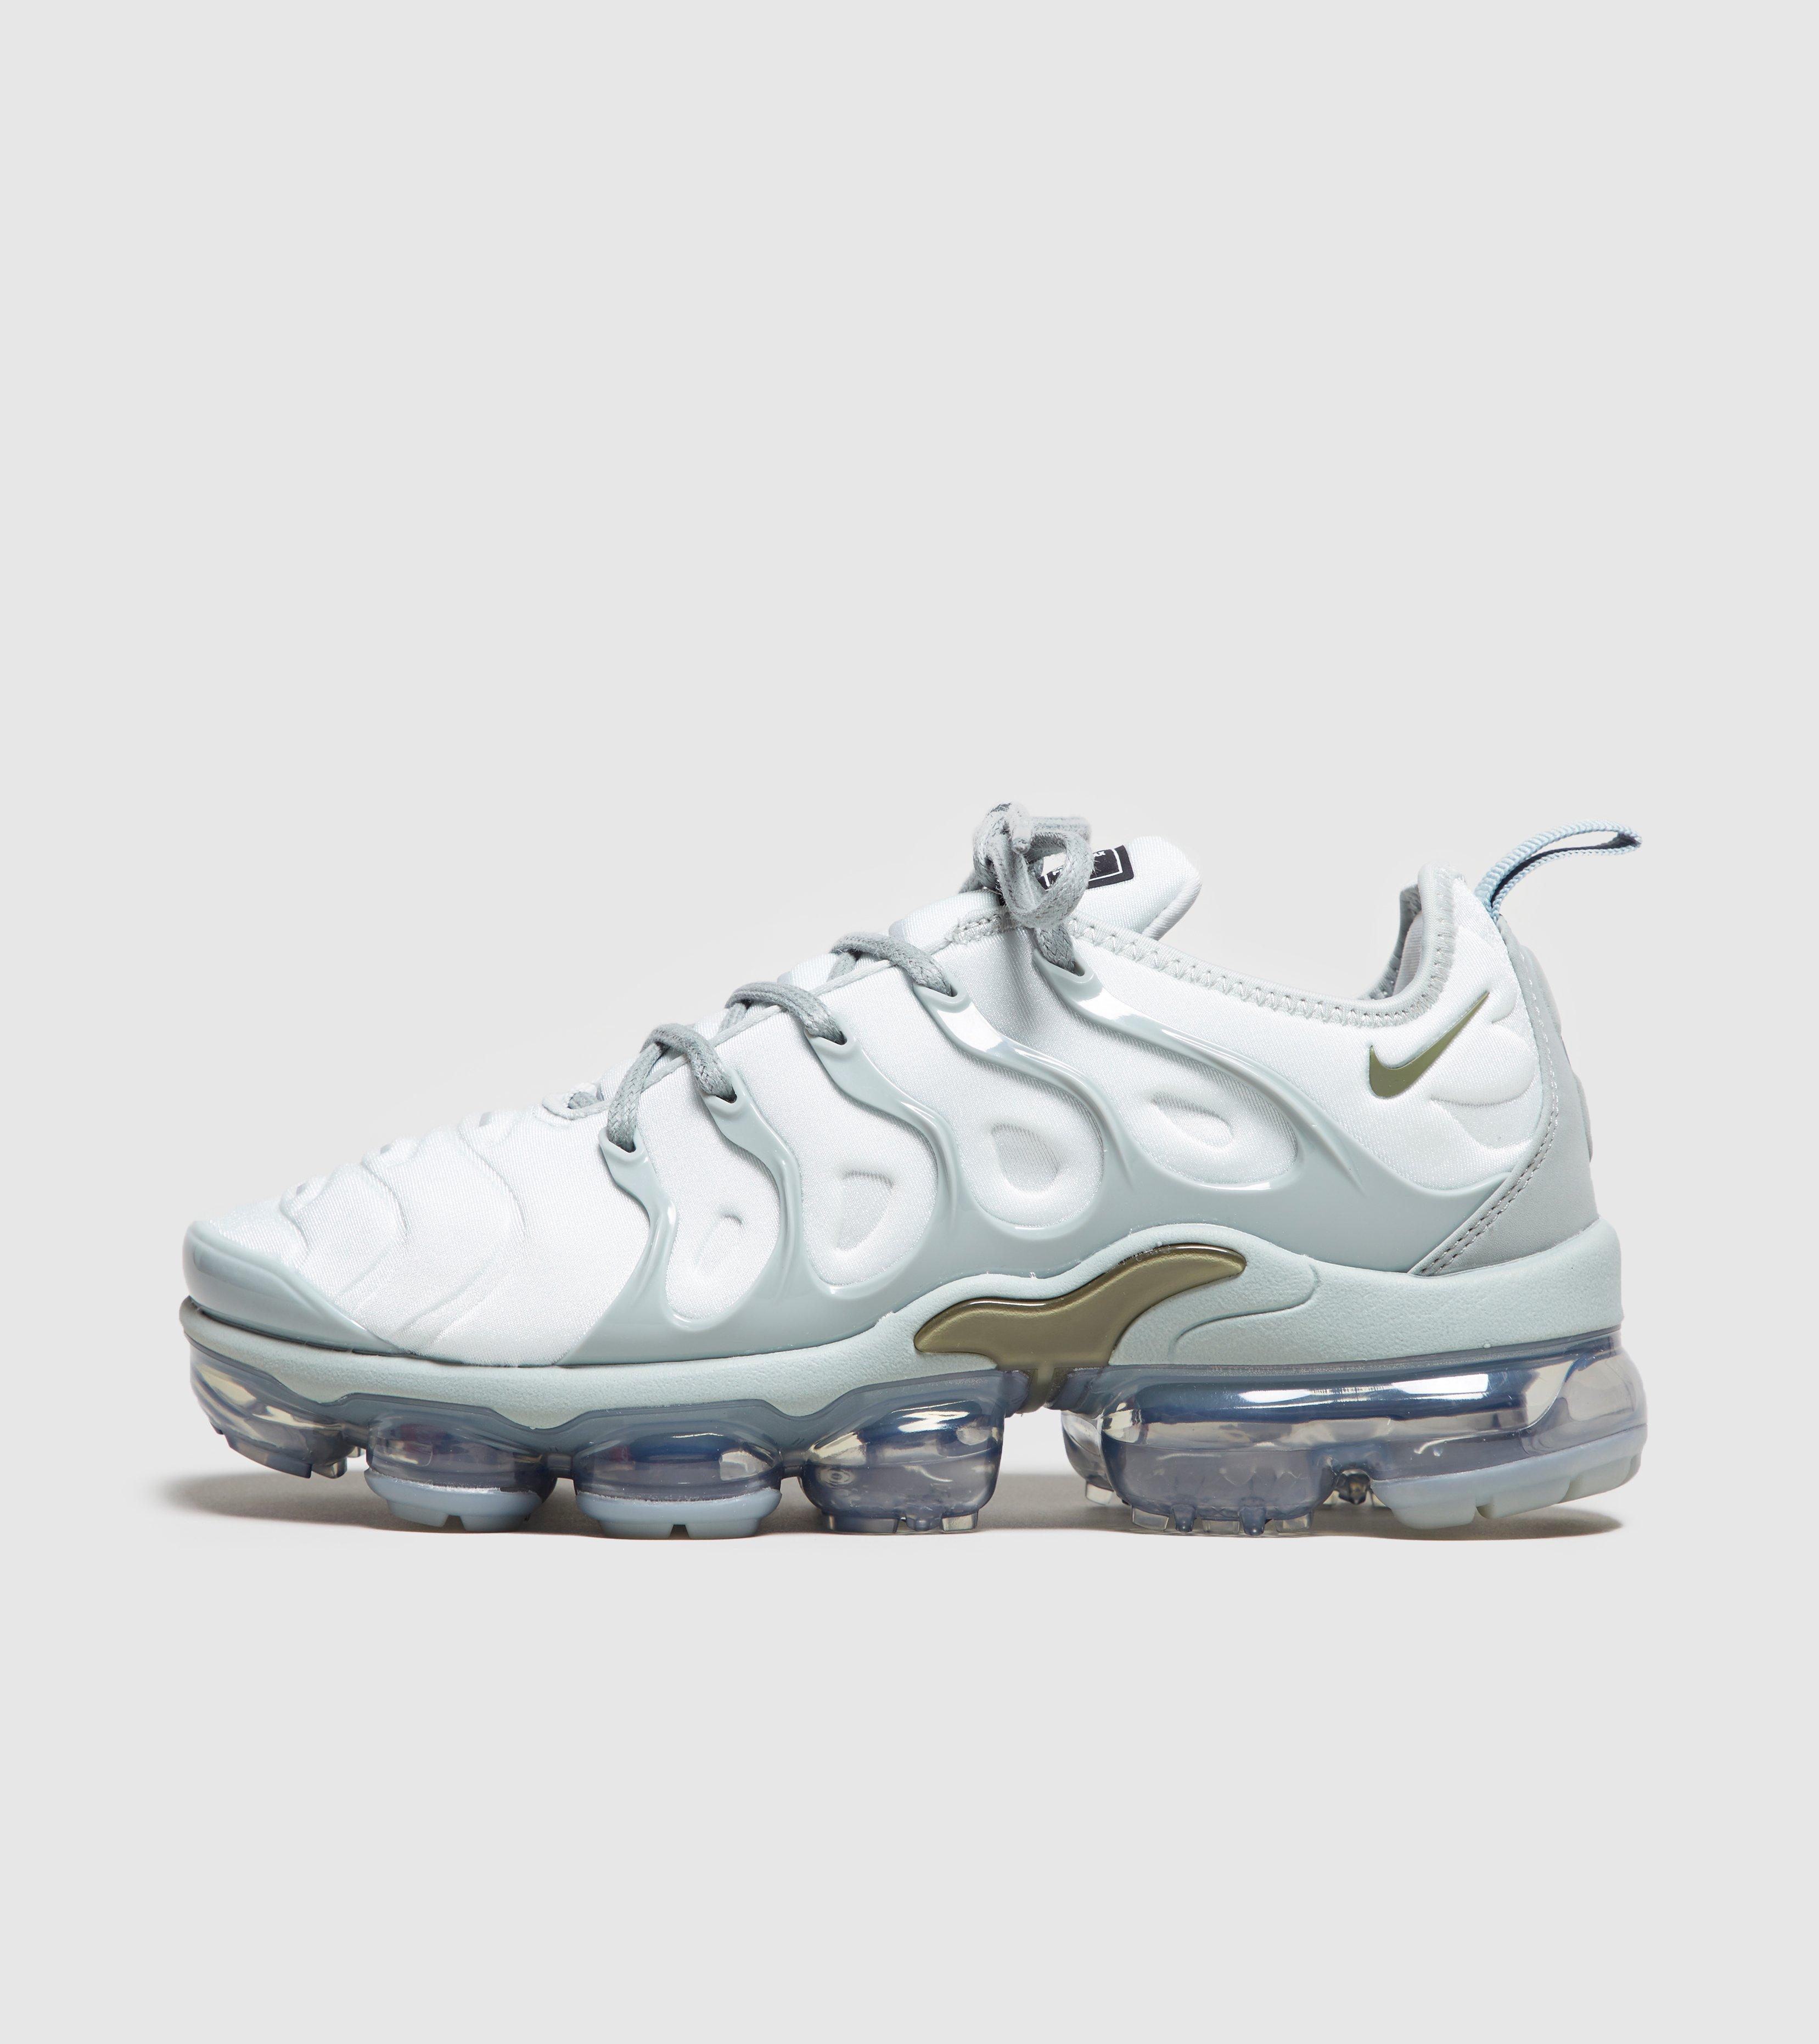 ac5703dca1f Nike Air Vapormax Plus Women s in White - Lyst